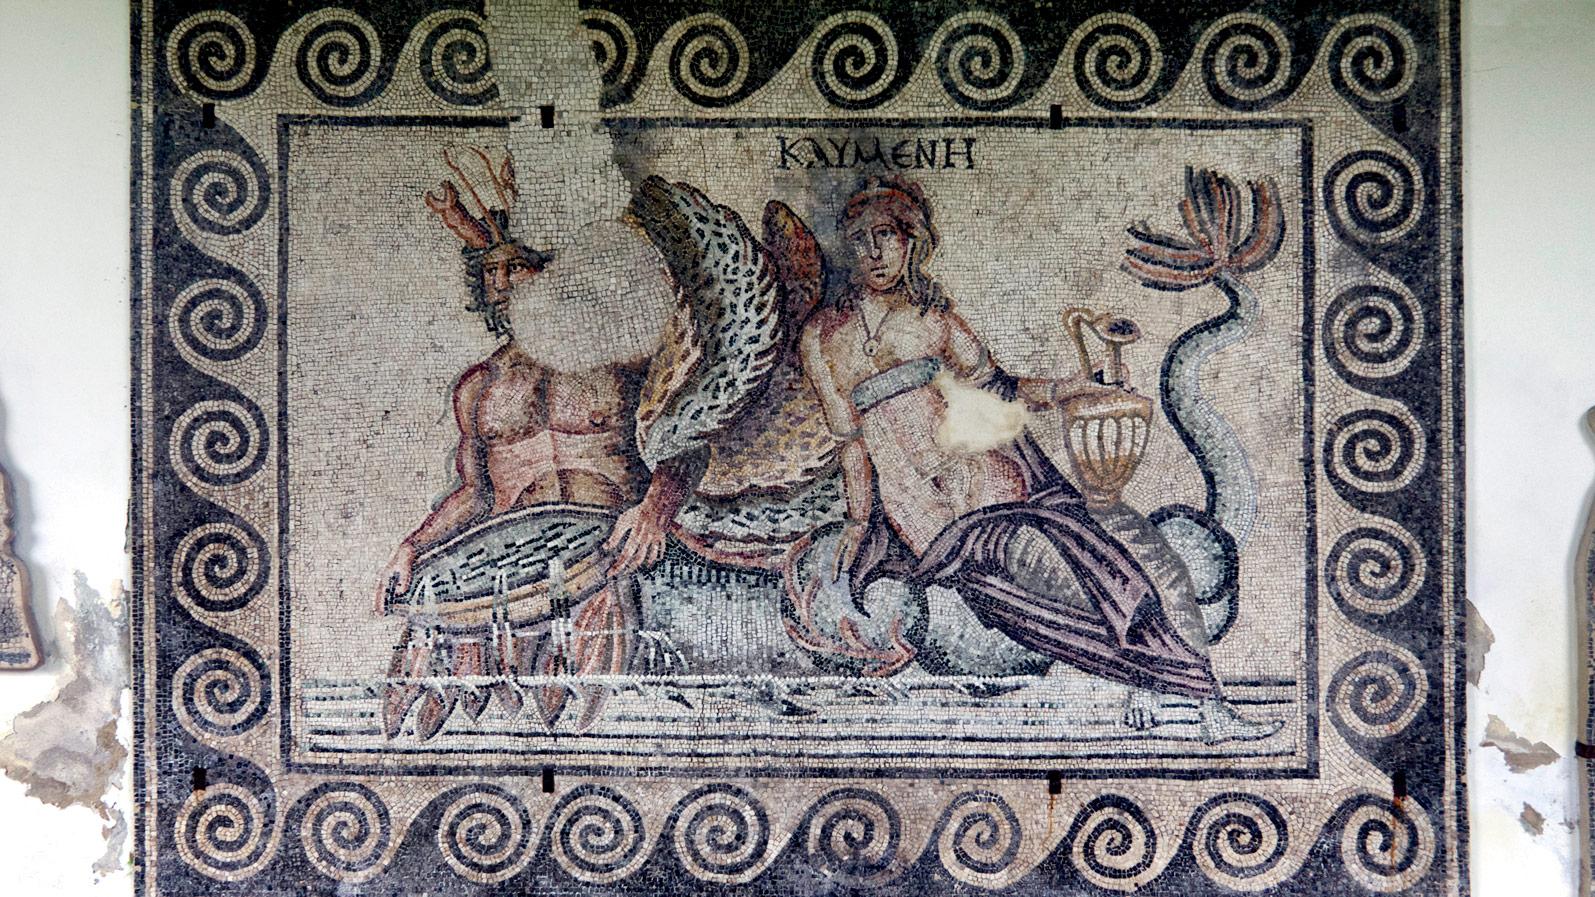 Aquileia; Фриули Венеция Джулия,Friuli Venezia Giulia, Италия